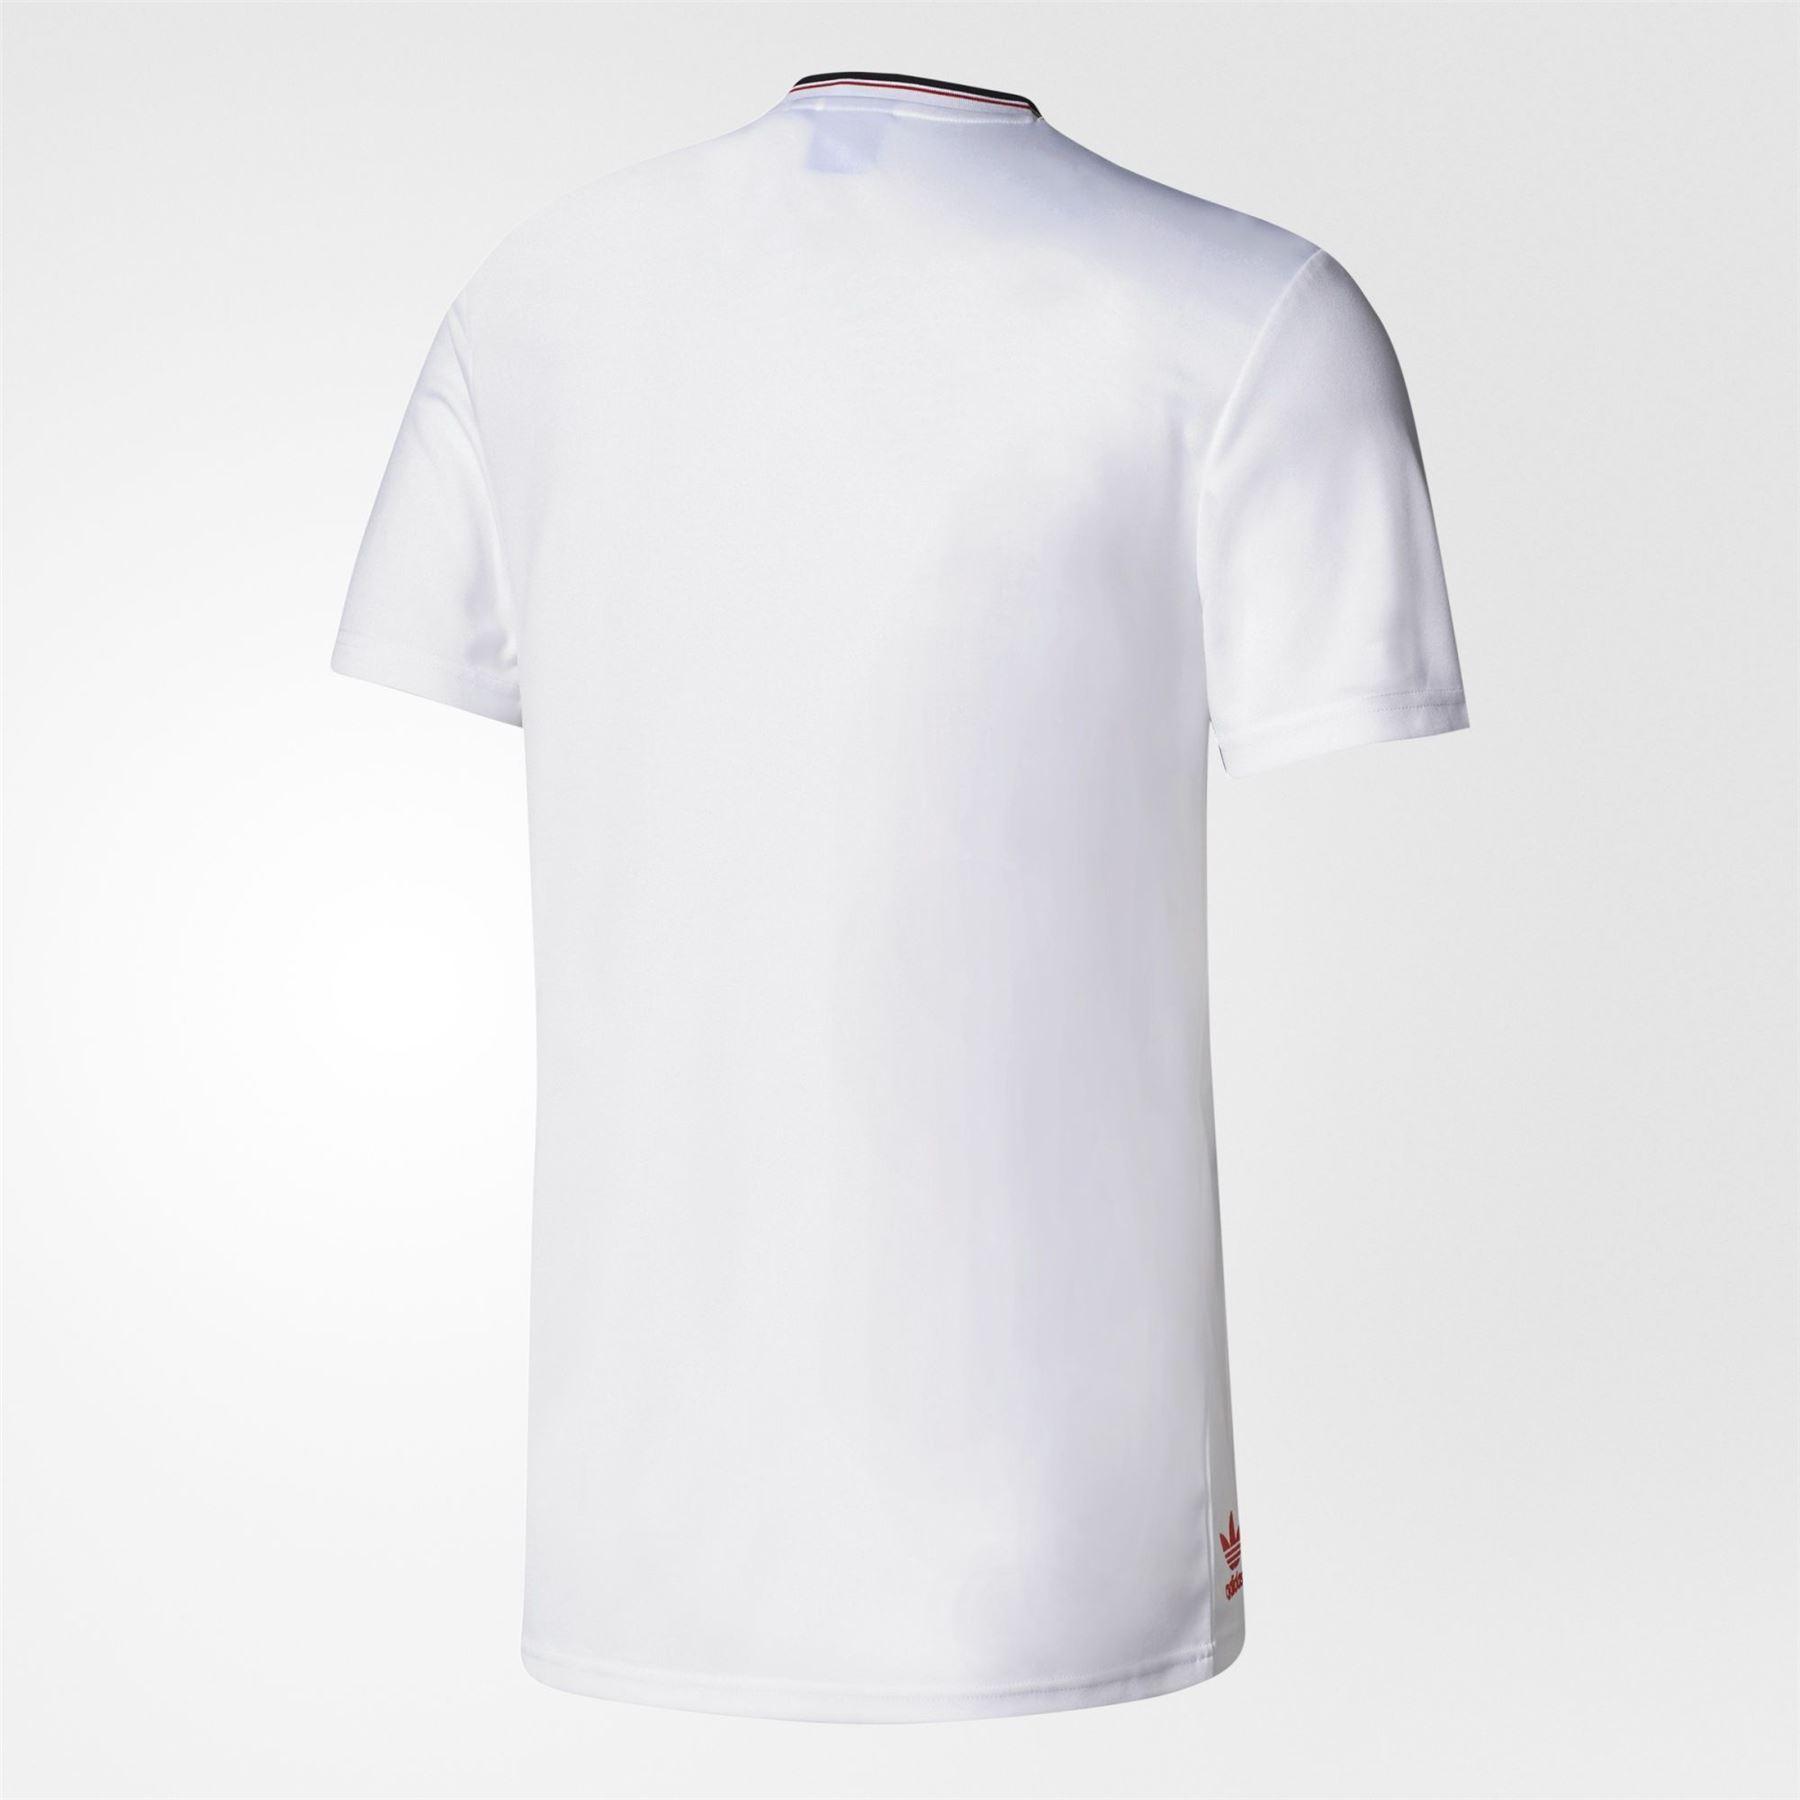 1e0b78b09 adidas ORIGINALS MANCHESTER UNITED RETRO T SHIRT WHITE RETRO 80S 90S NEW  MEN S